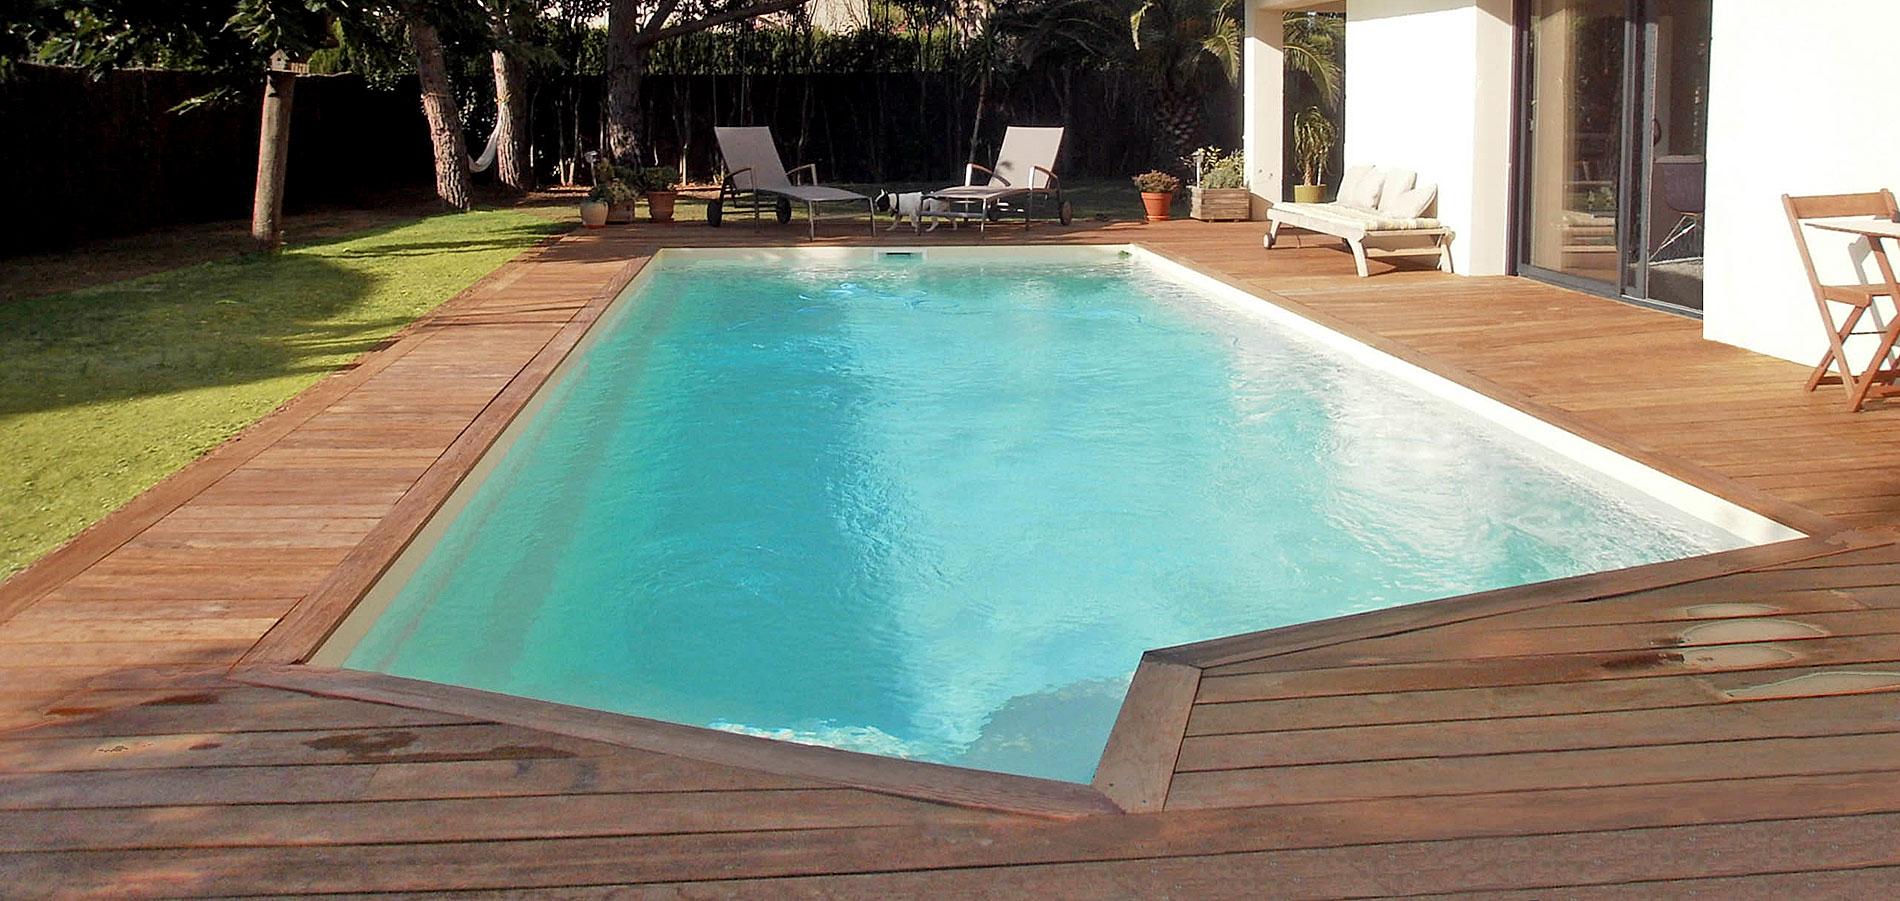 mapico, piscine coque polyester, piscine coque, porto-vecchio, corse, jardin, réalisations, devis, 16